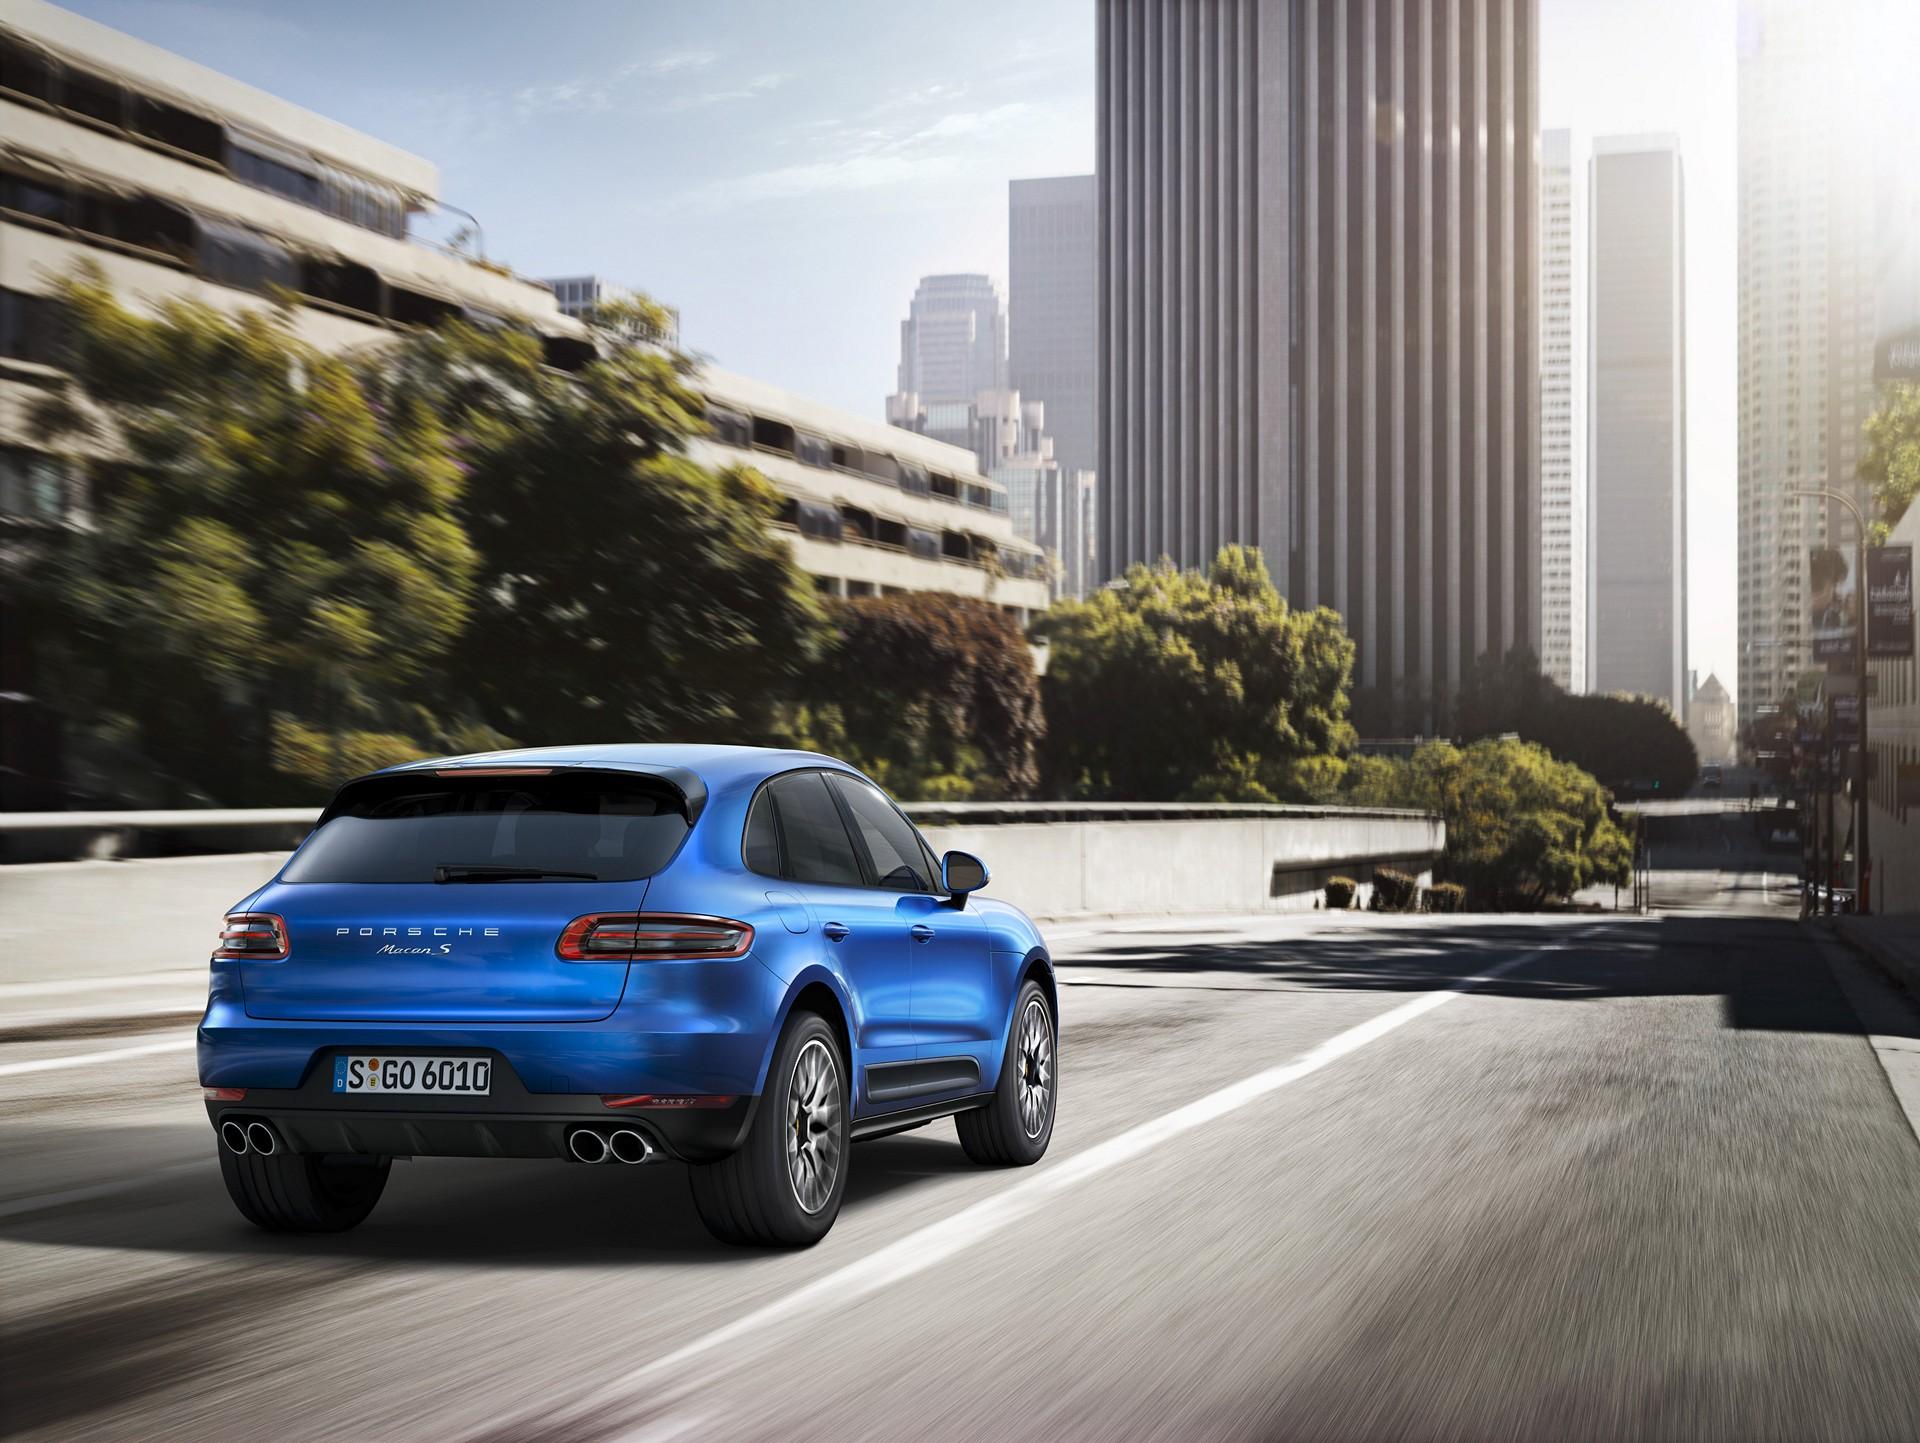 2015 Porsche Macan © Dr. Ing. h.c. F. Porsche AG